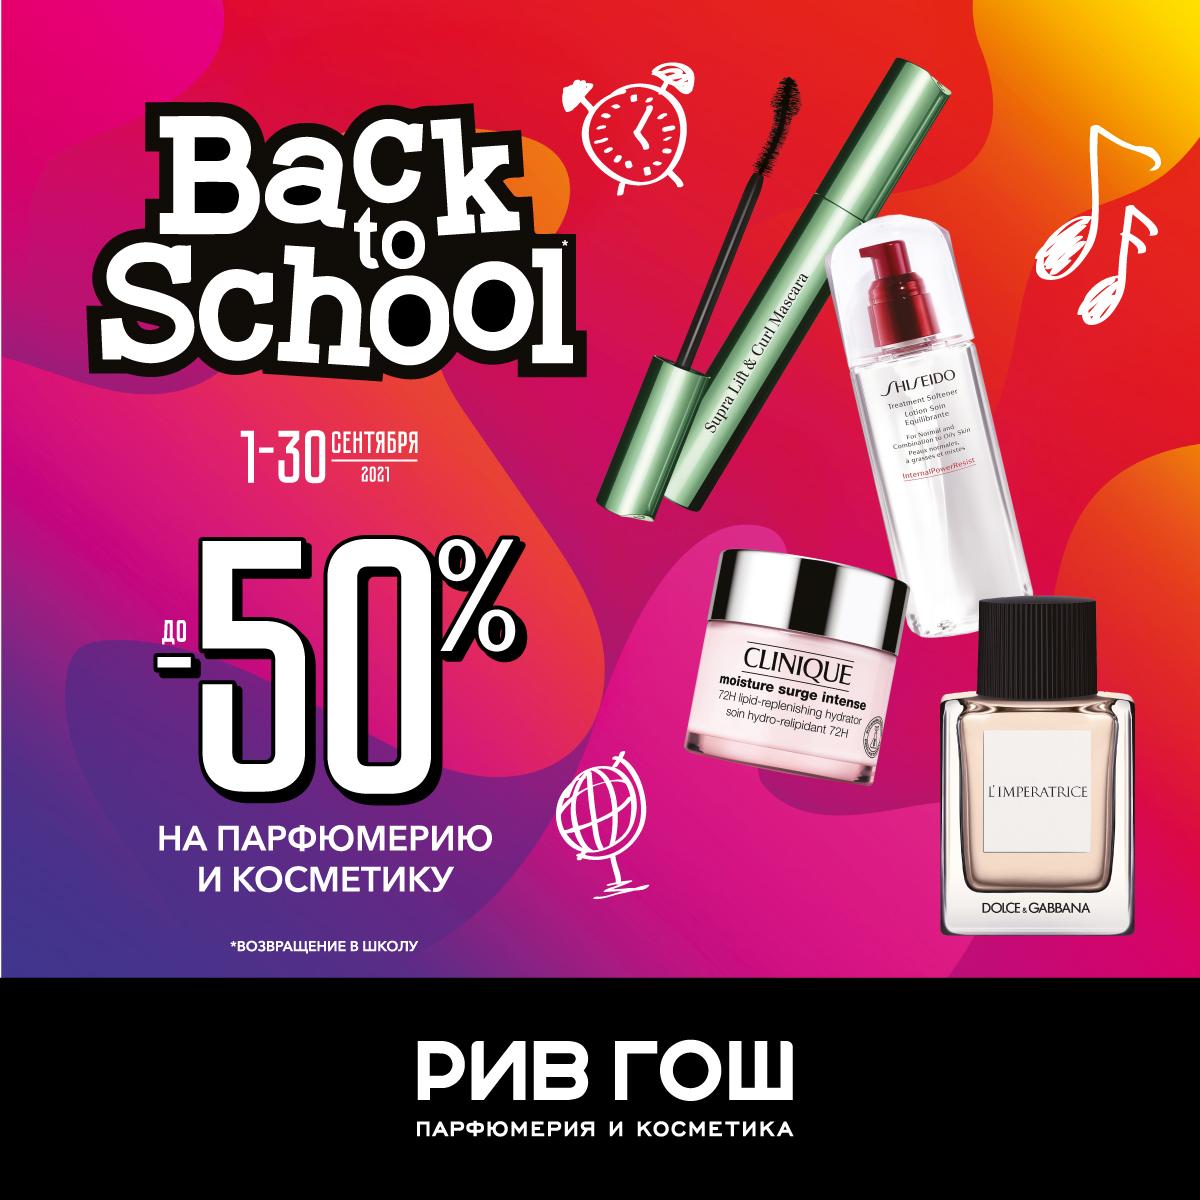 BACK TO SCHOOL РИВ ГОШ!